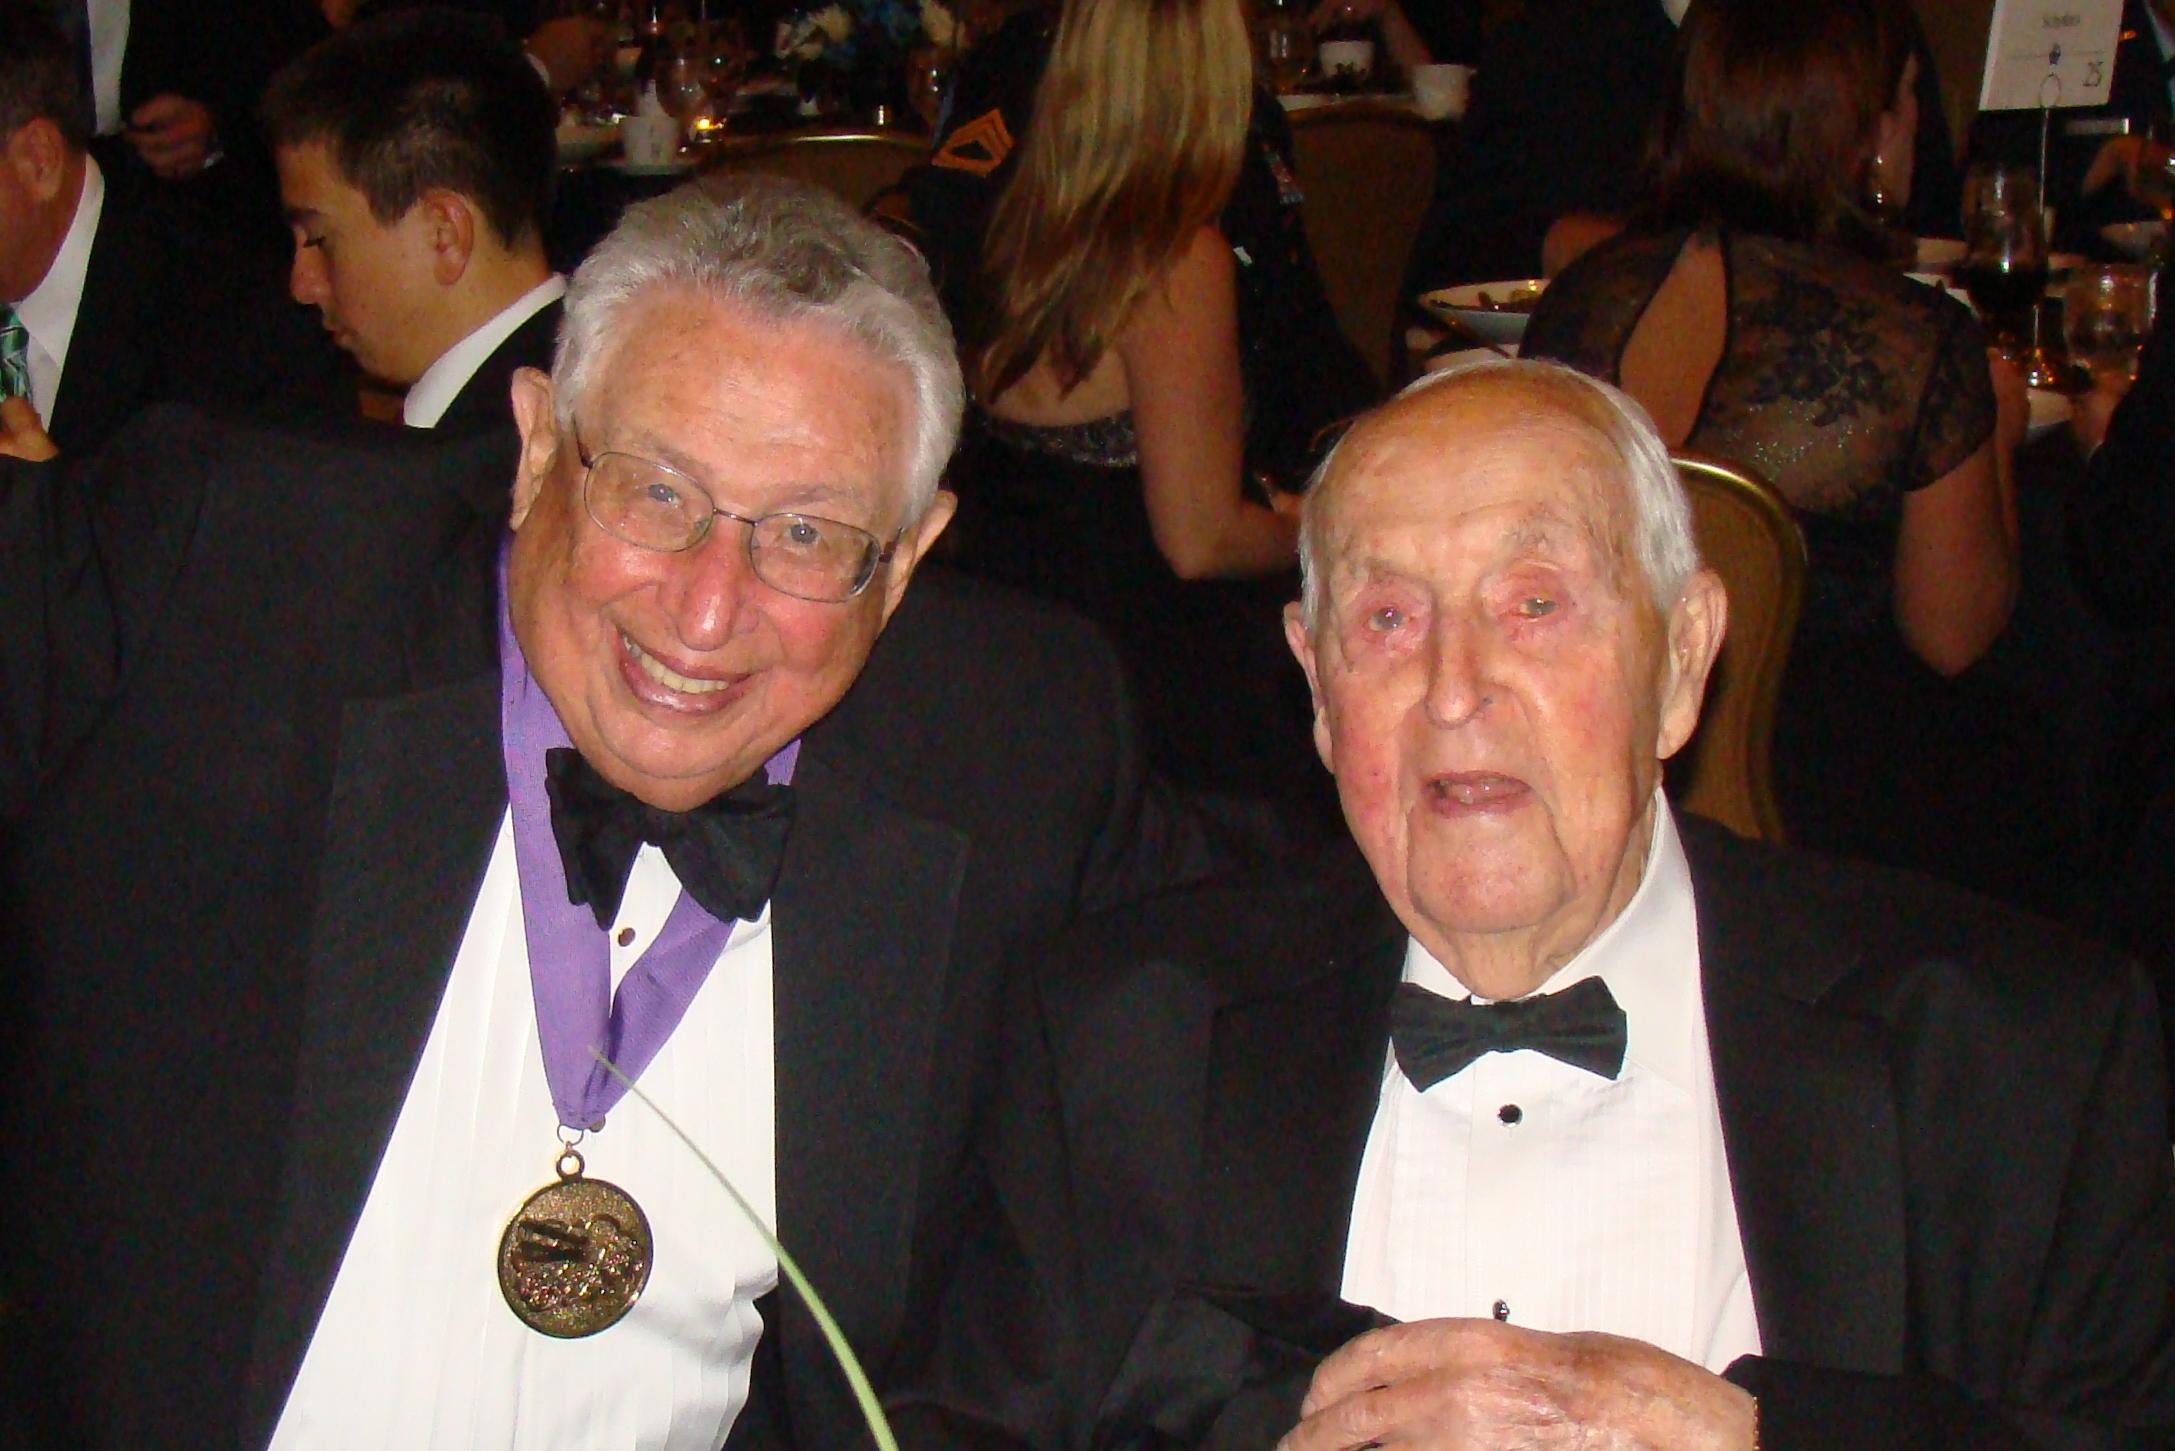 Edwin Colodny & Sir Lenox Hewitt - 1, 15 Nov '13 - Copy (2).JPG